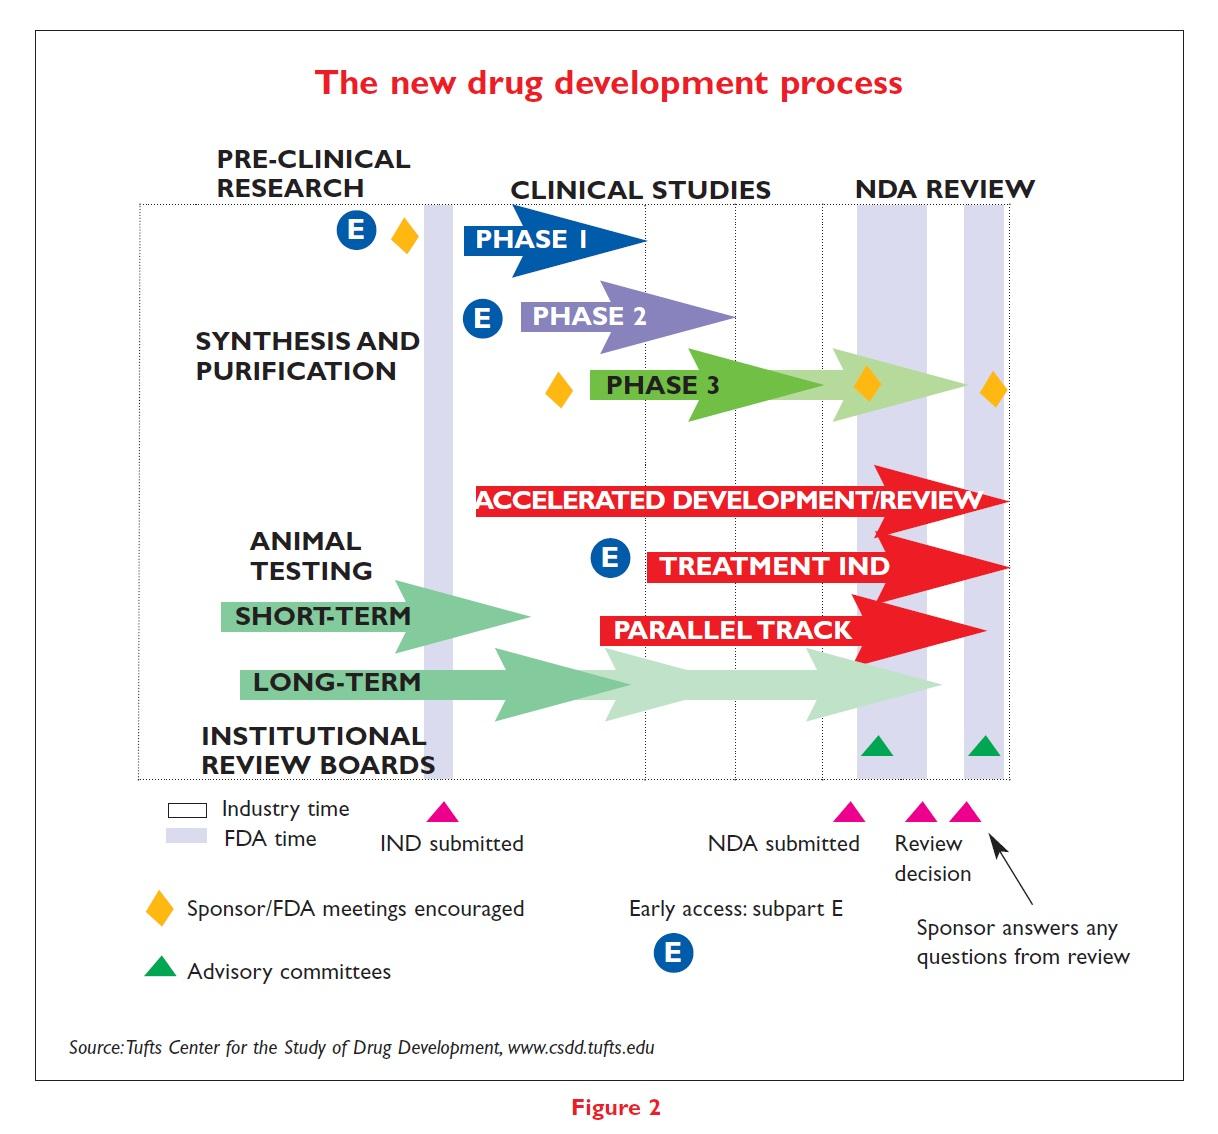 Figure 2 The new drug development process